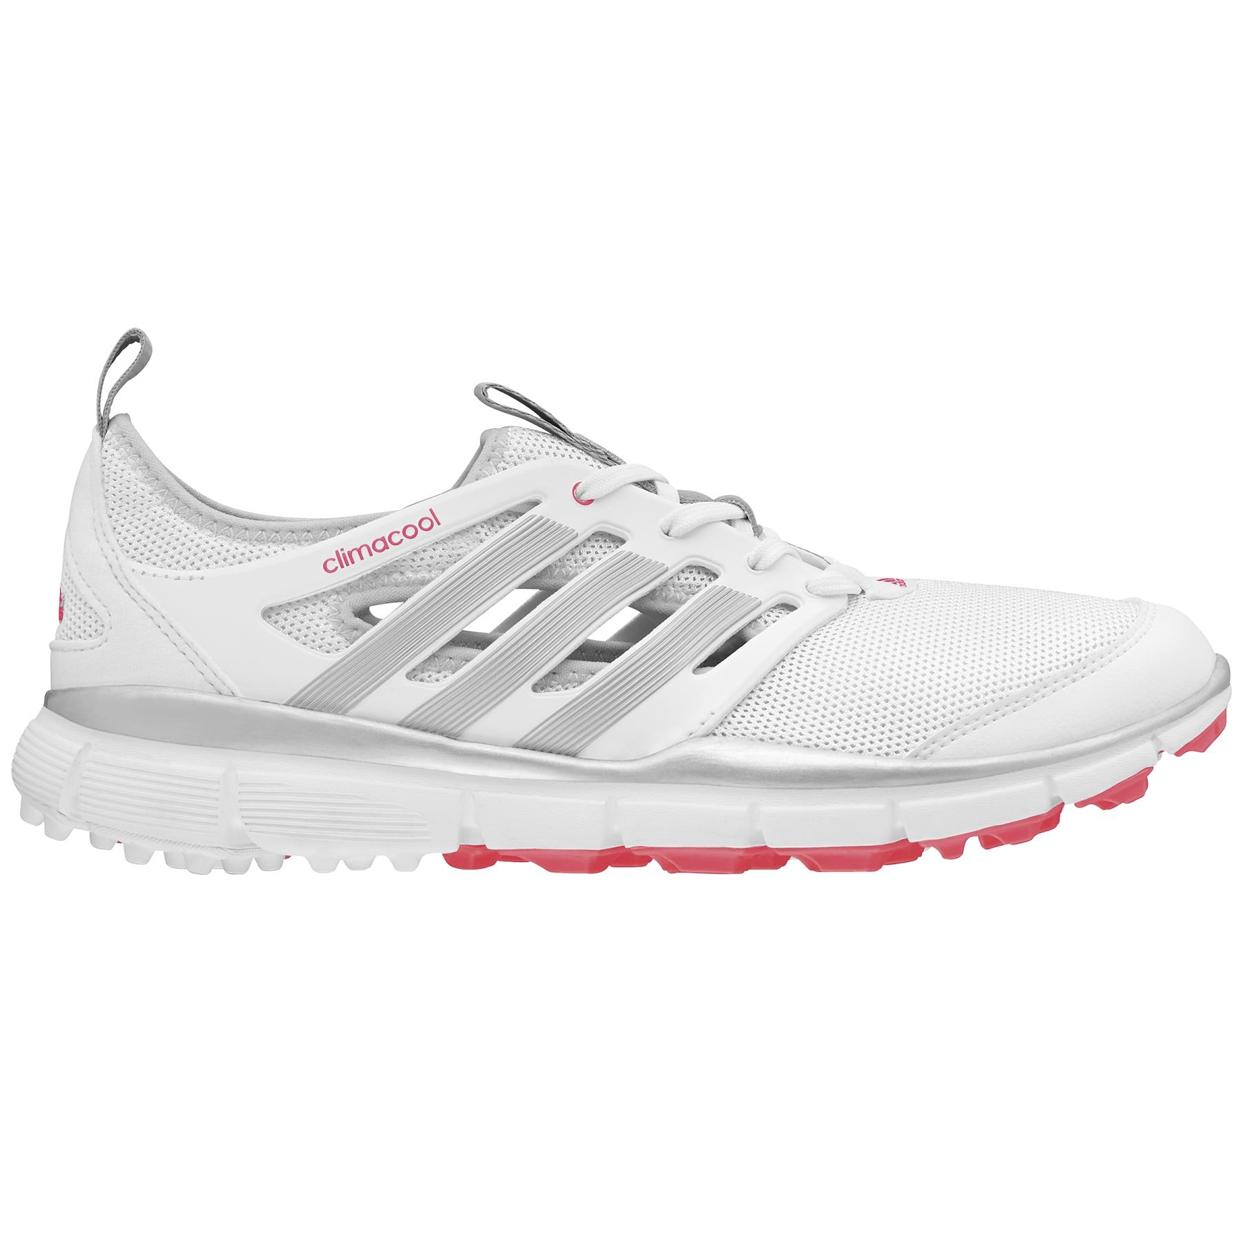 adidas s climacool ii spikeless golf shoes ebay